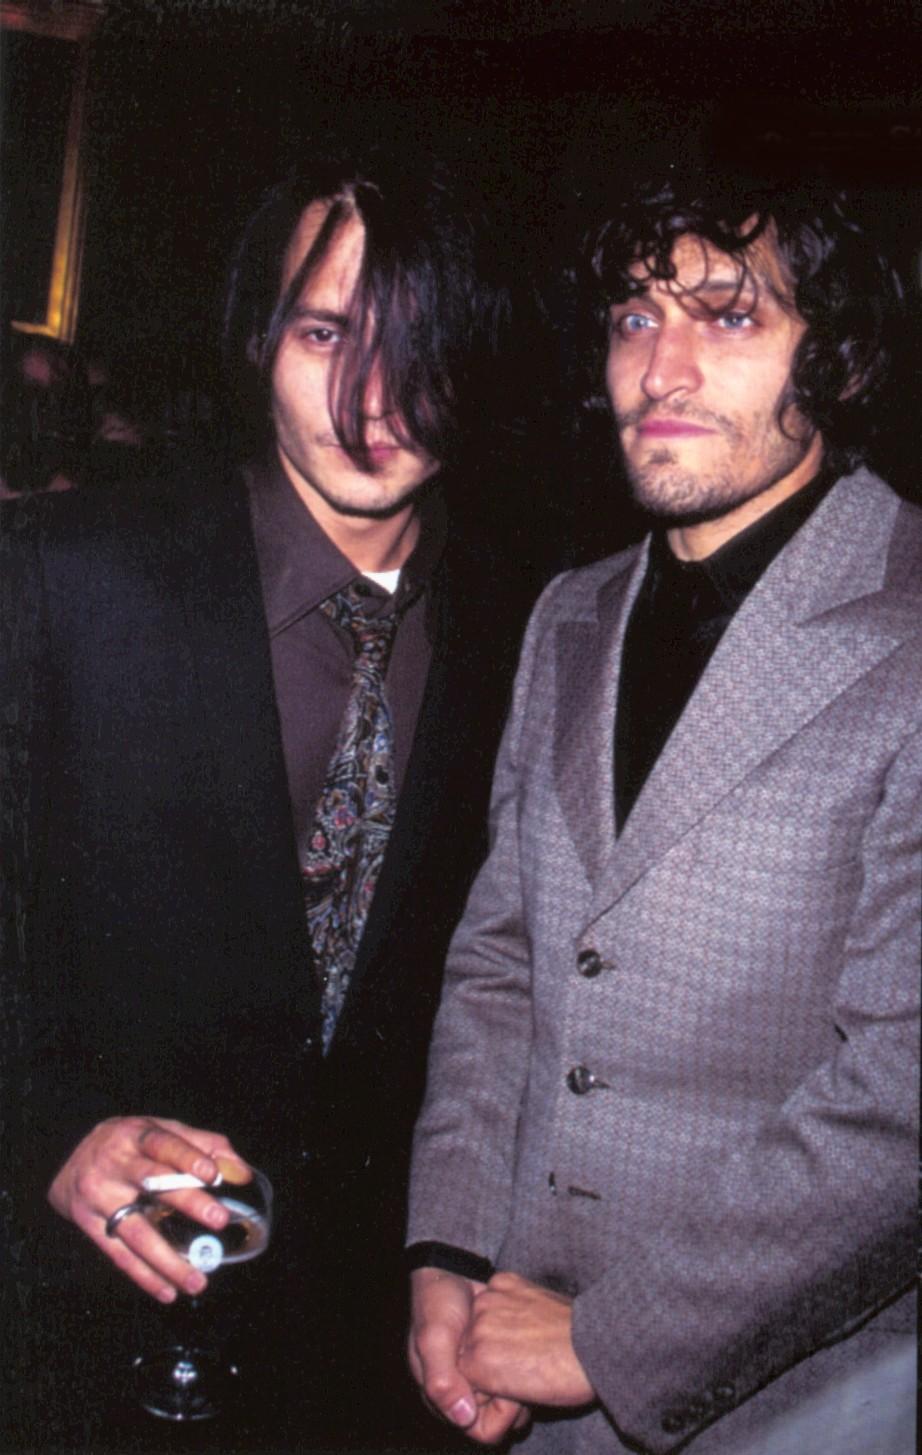 Vincent Gallo photo 4 ... Johnny Depp